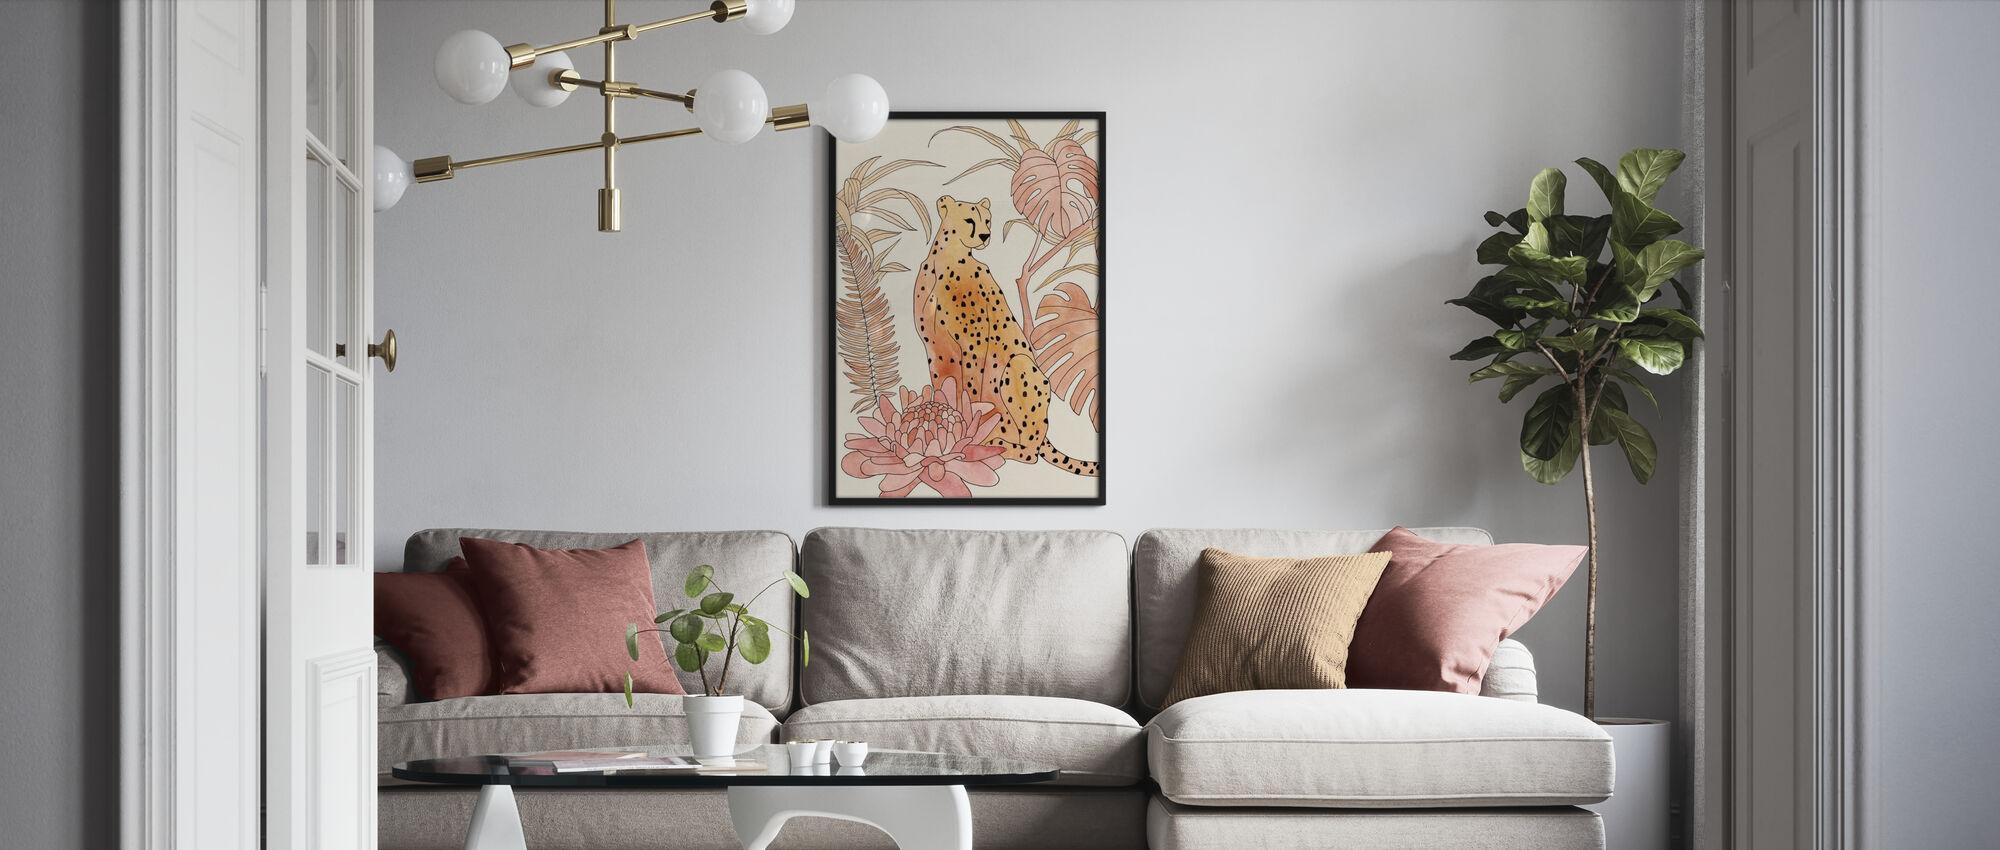 Blush Cheetah - Poster - Living Room